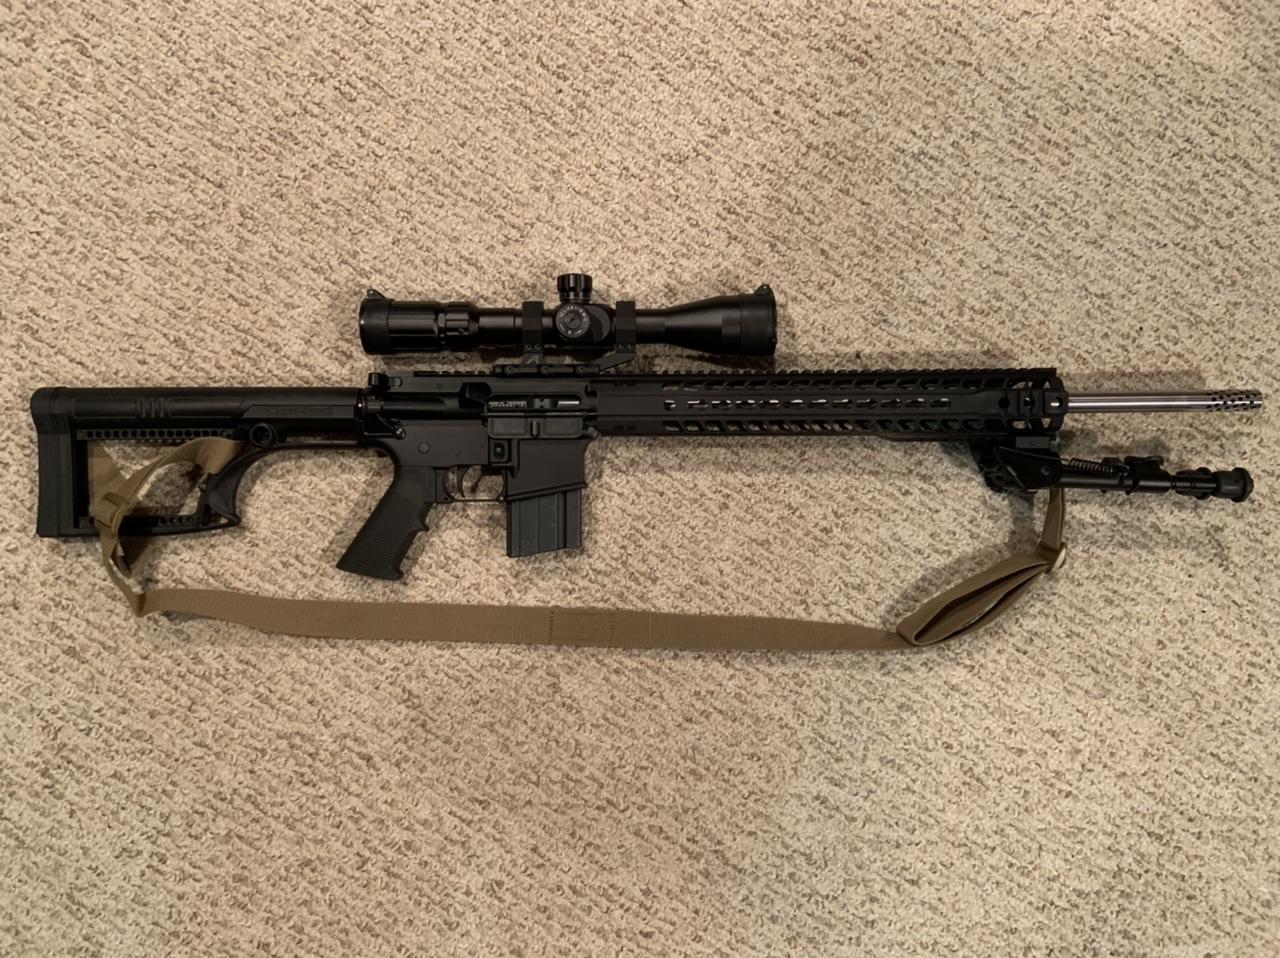 Rifle Picture Thread-928743f3-eae8-42d7-a8c2-9f8c81ed8146_1580239861642.jpeg